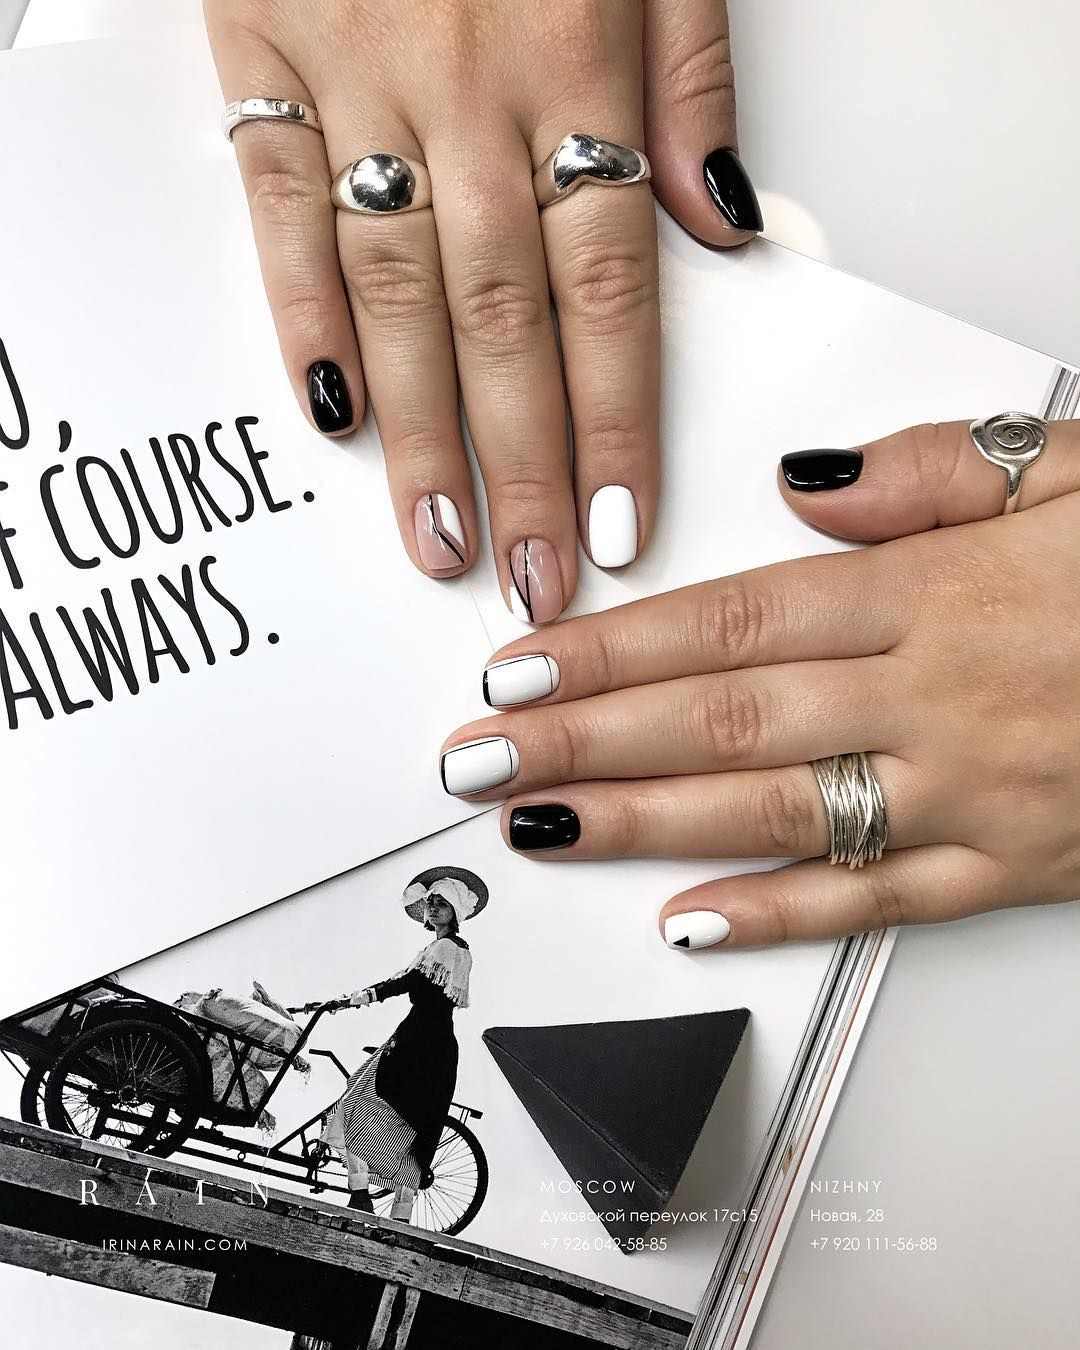 Pin by Heni Moldvai on Nails❤ | Pinterest | Manicure